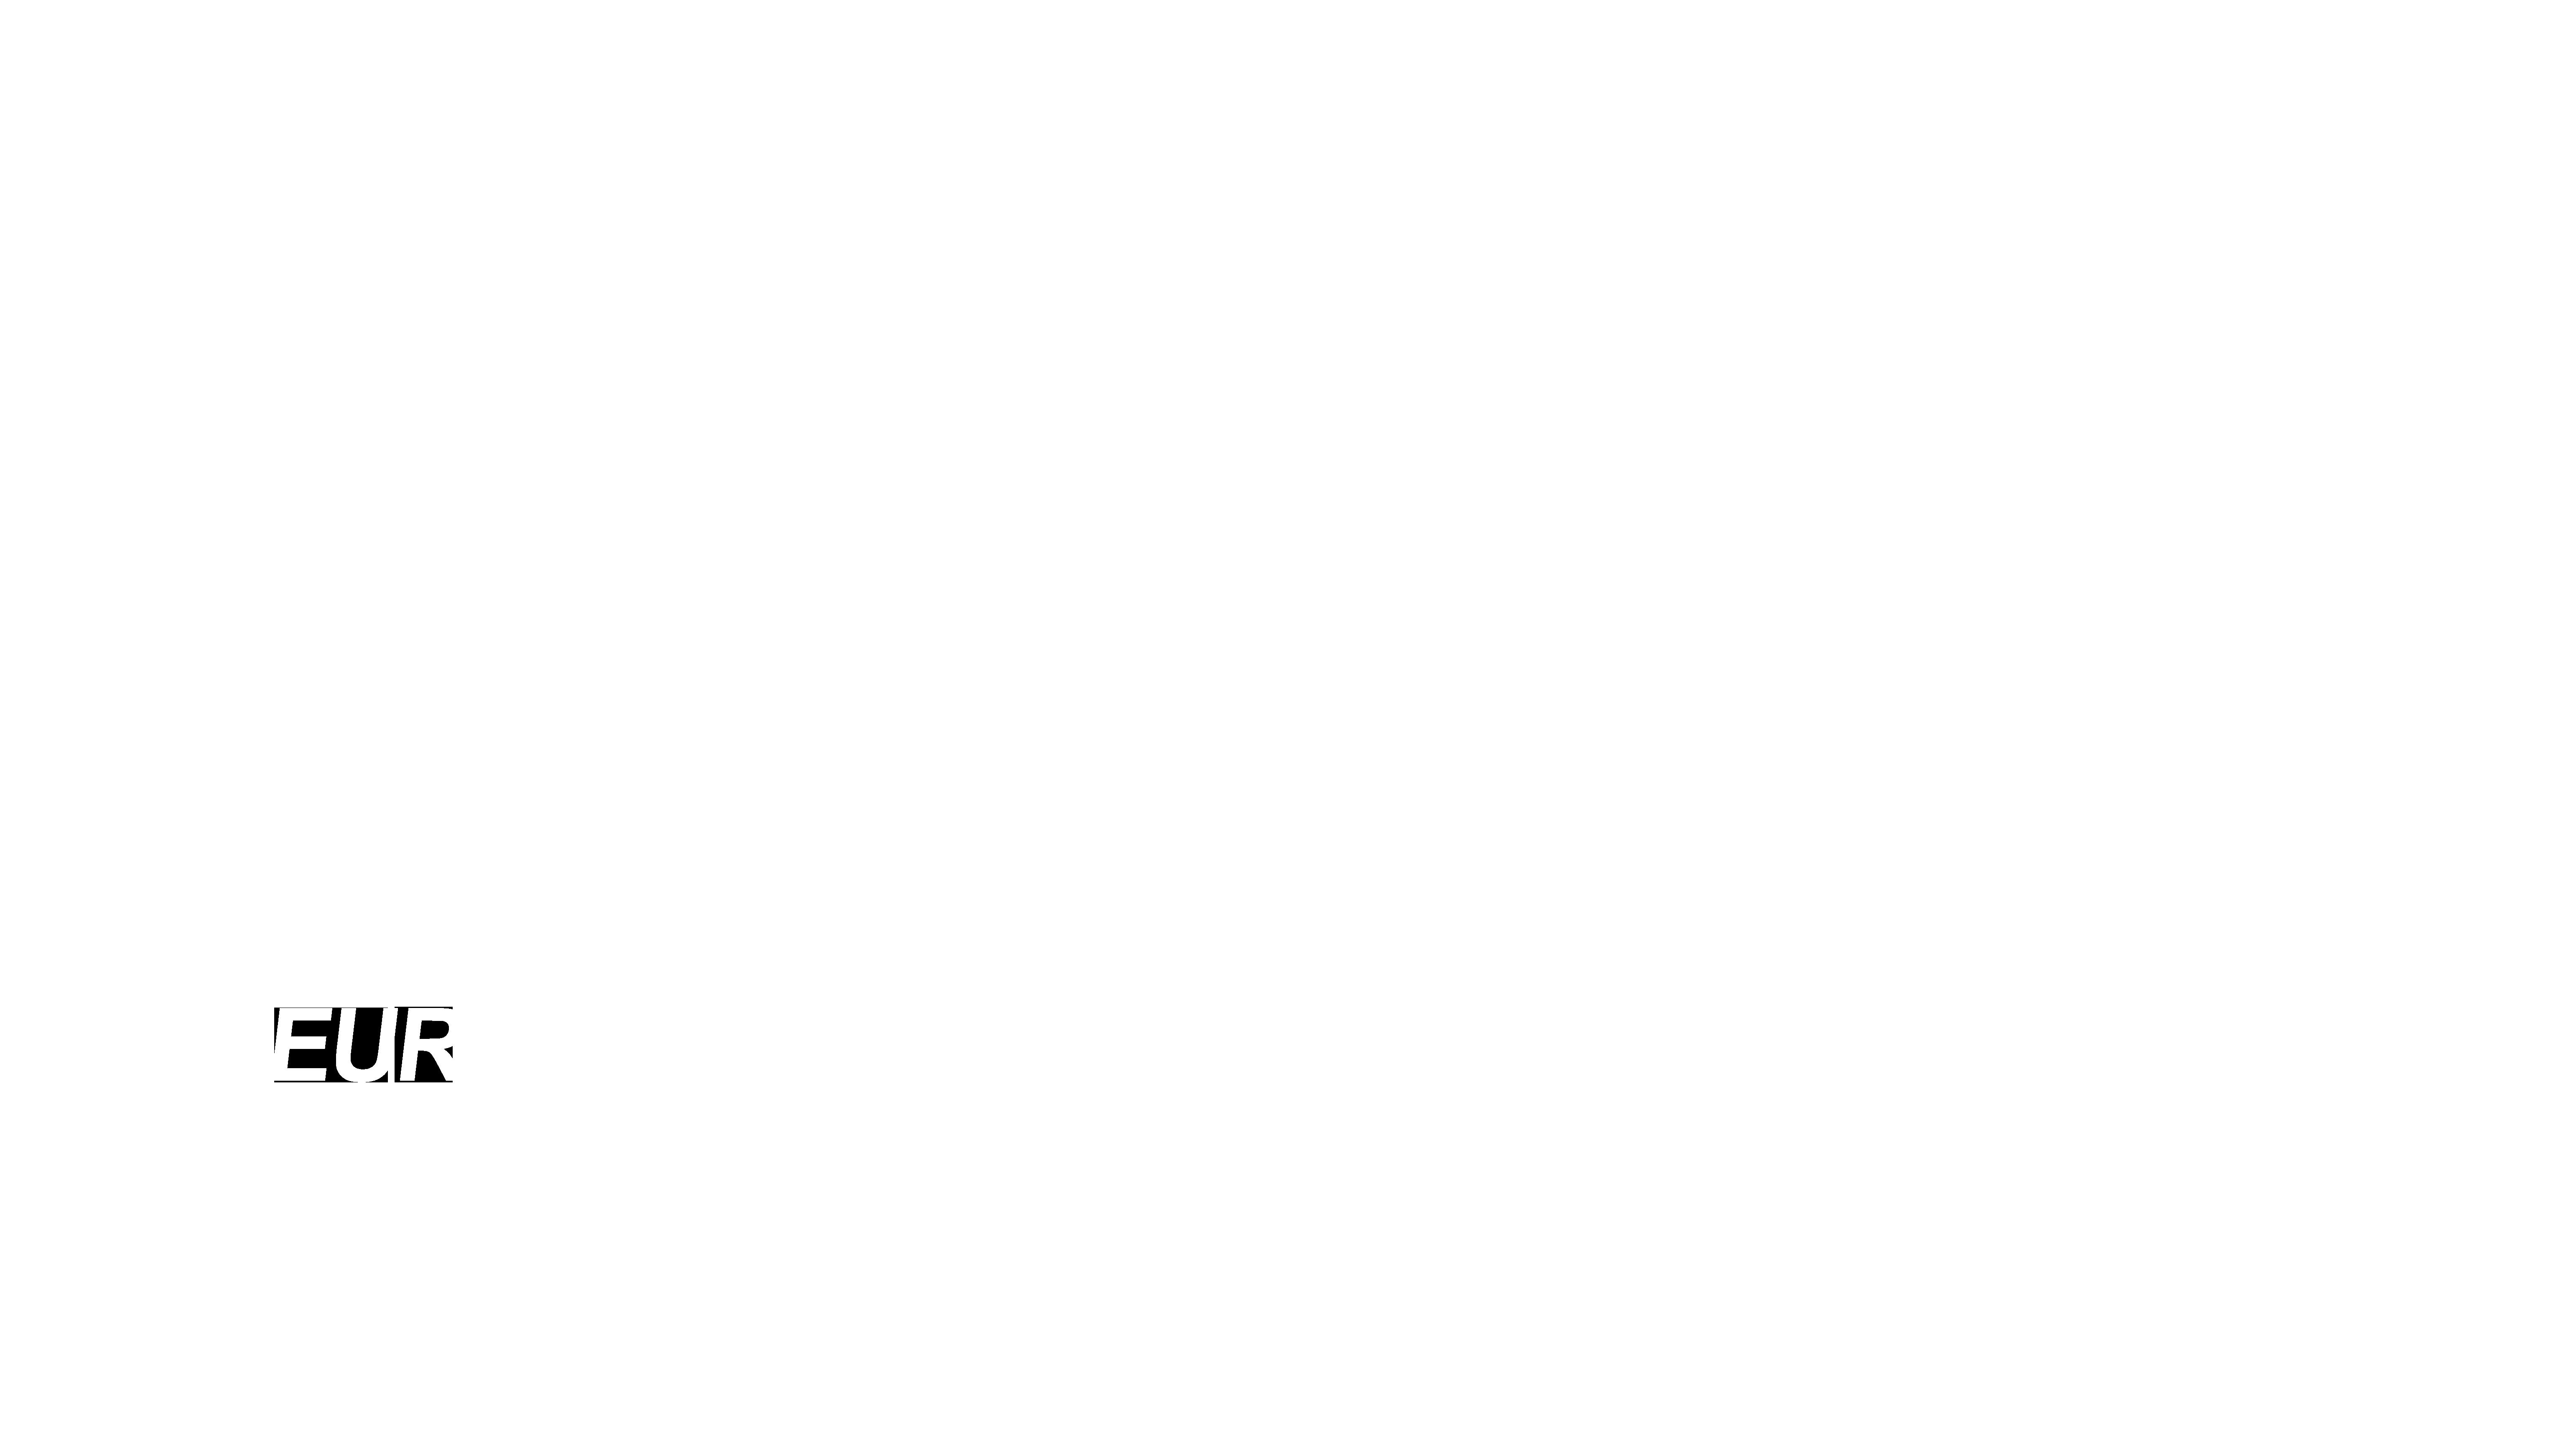 logo EUPL halo blanc